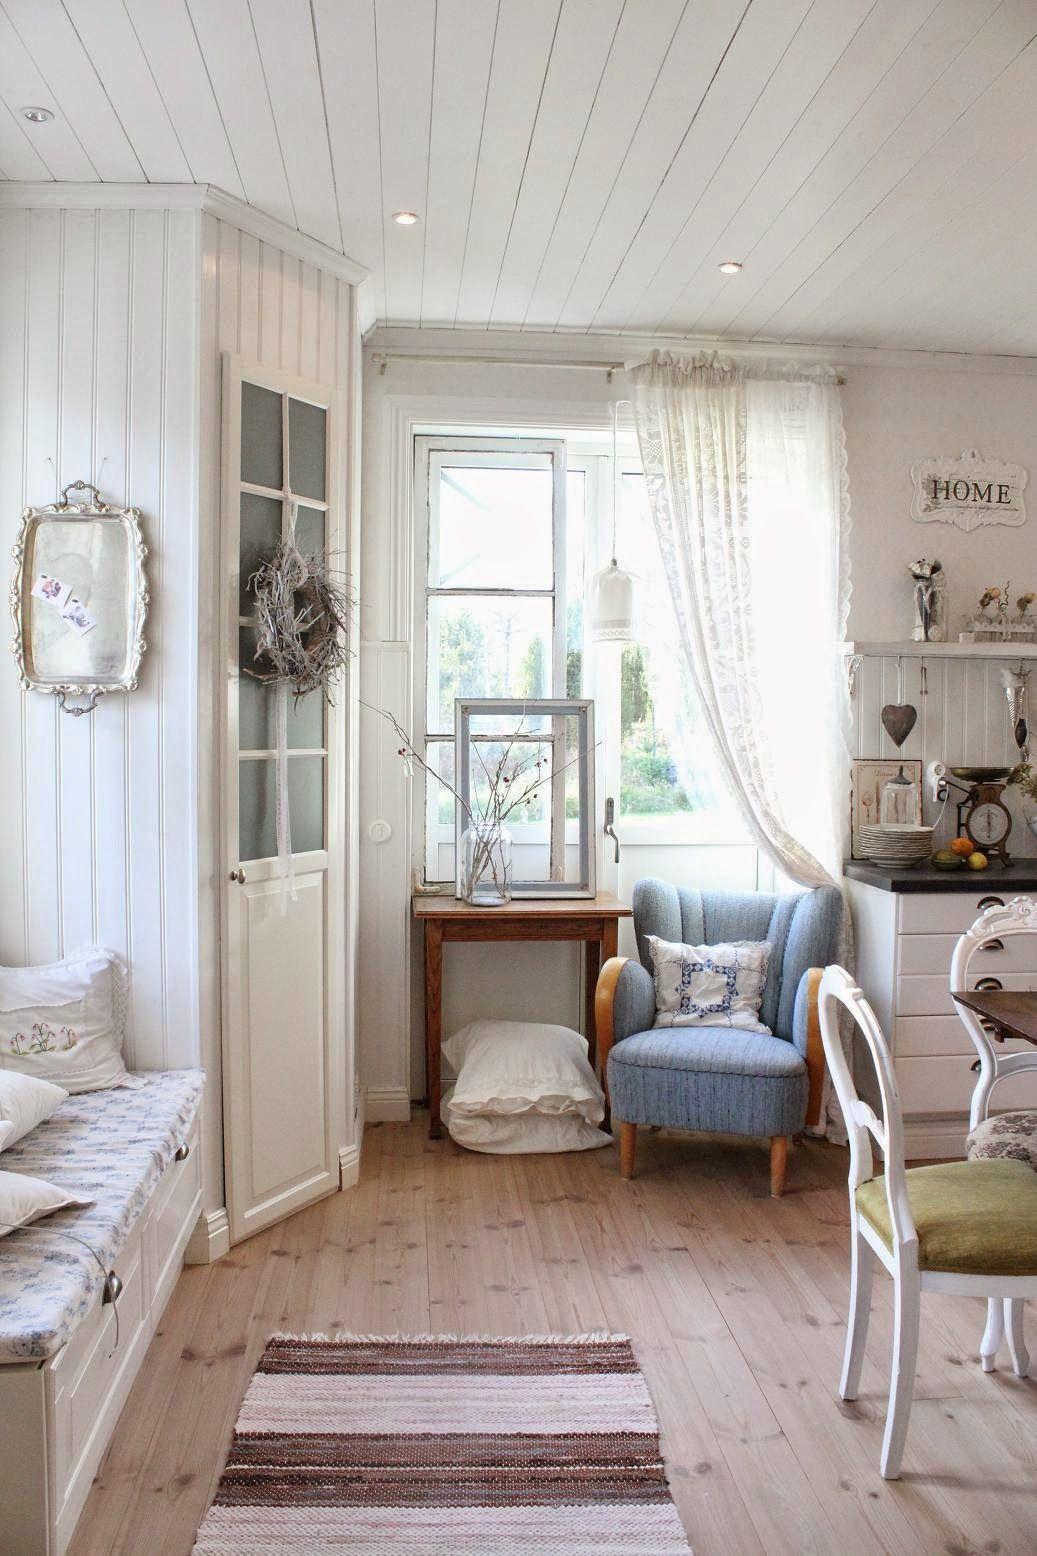 http://clarashempabyvagen.blogspot.de/